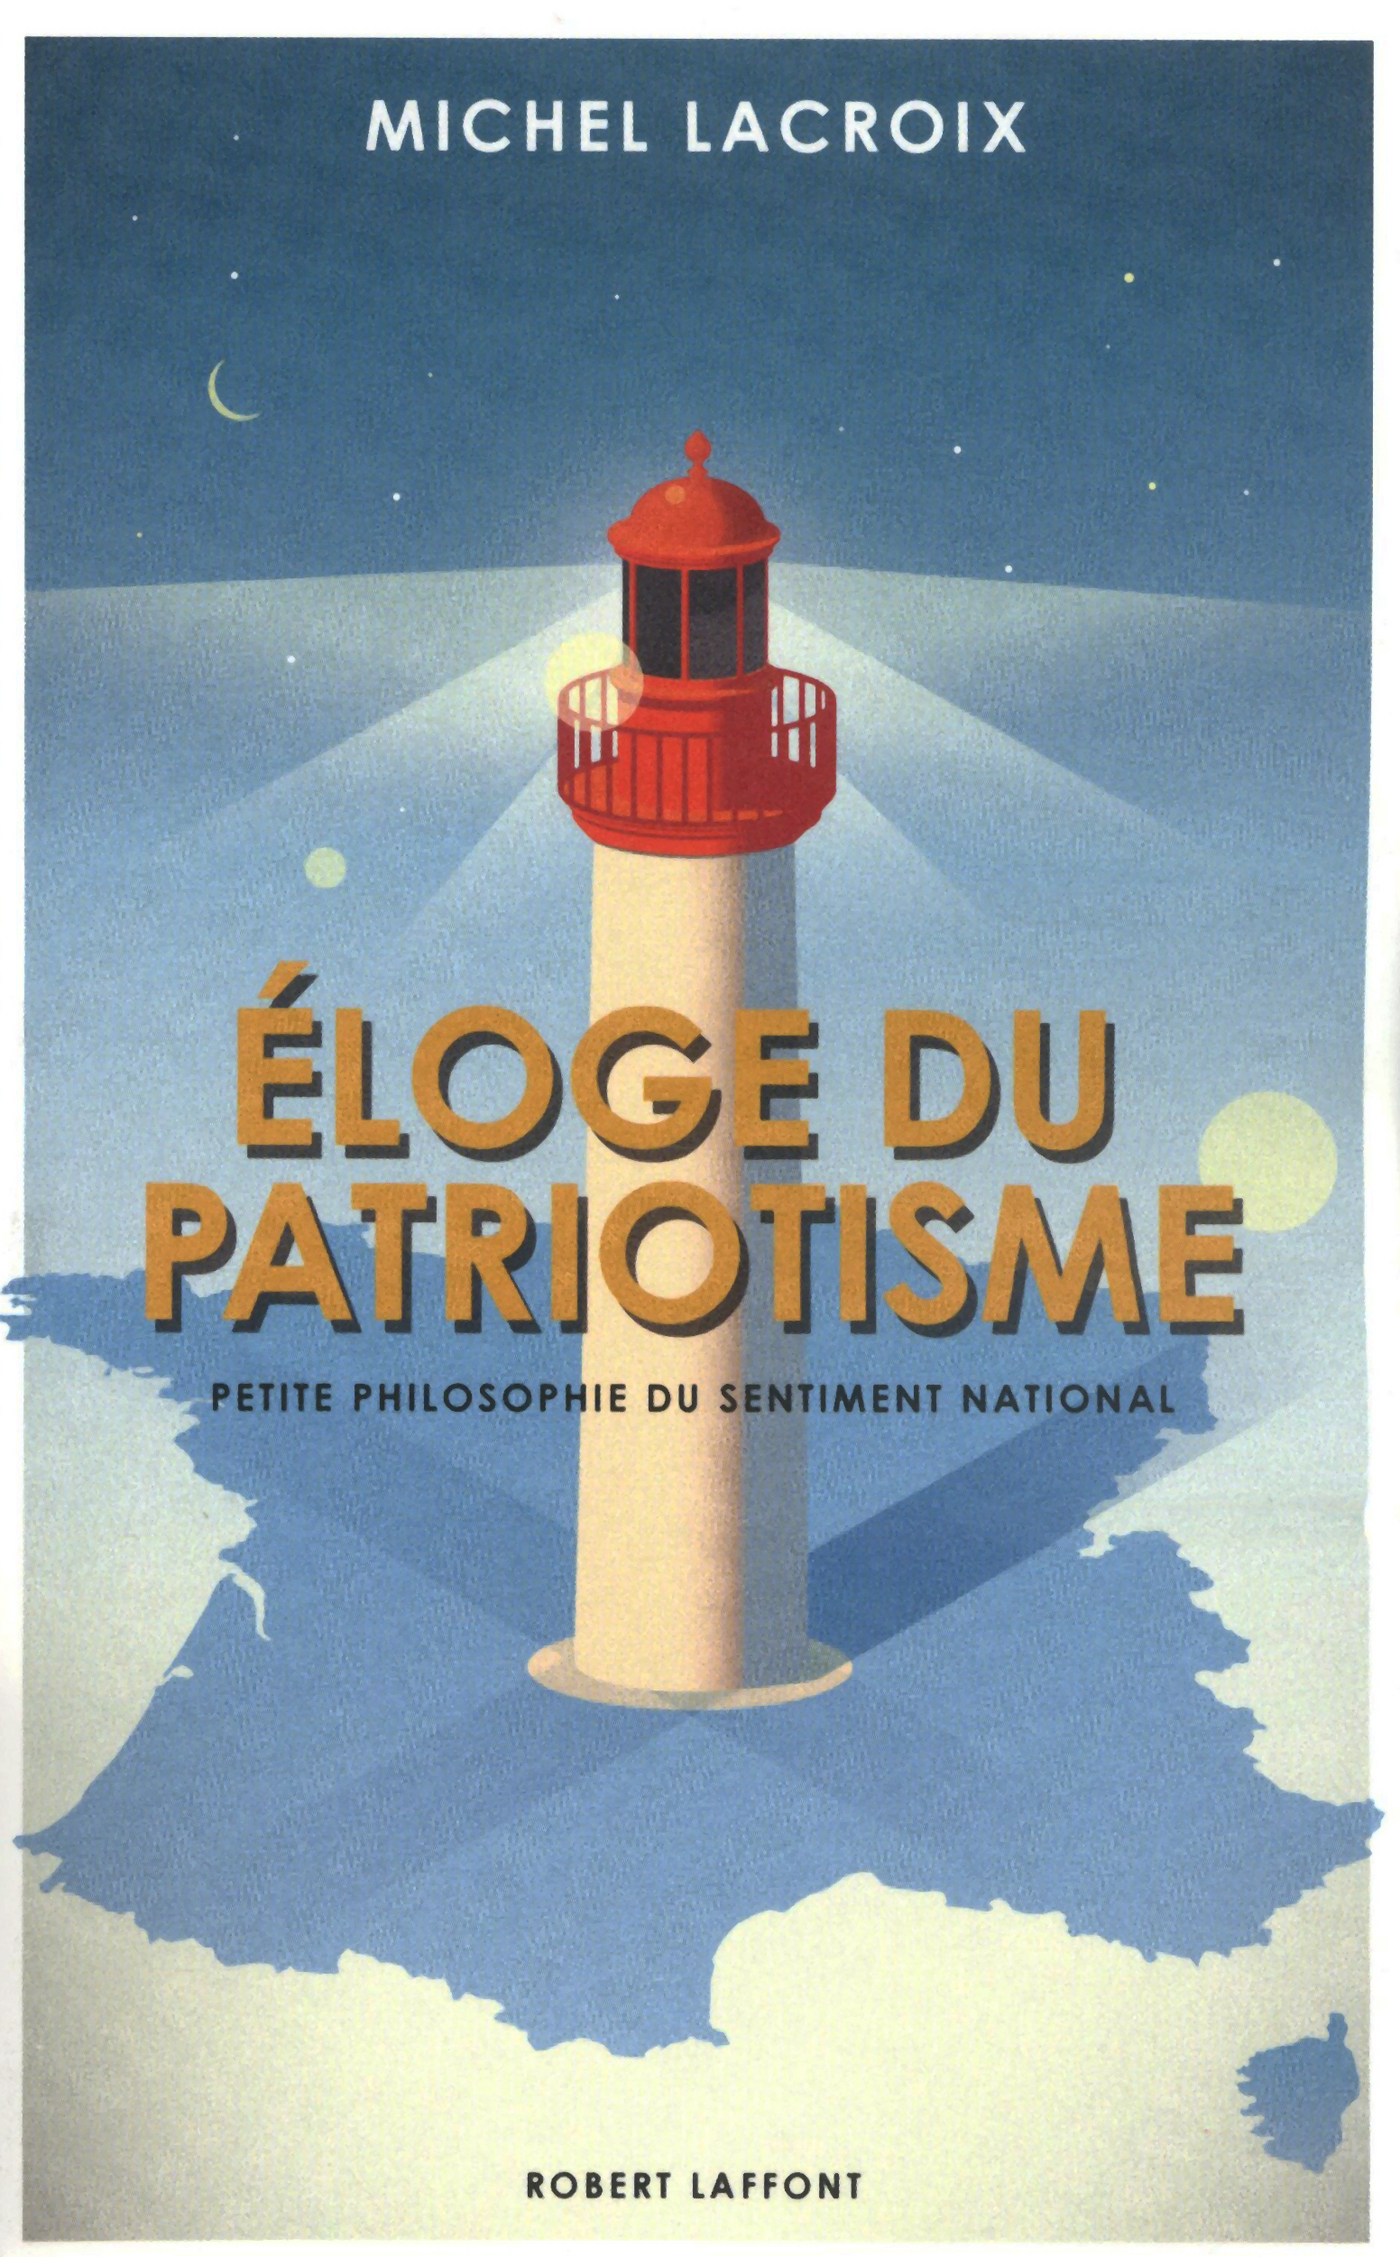 Eloge du patriotisme